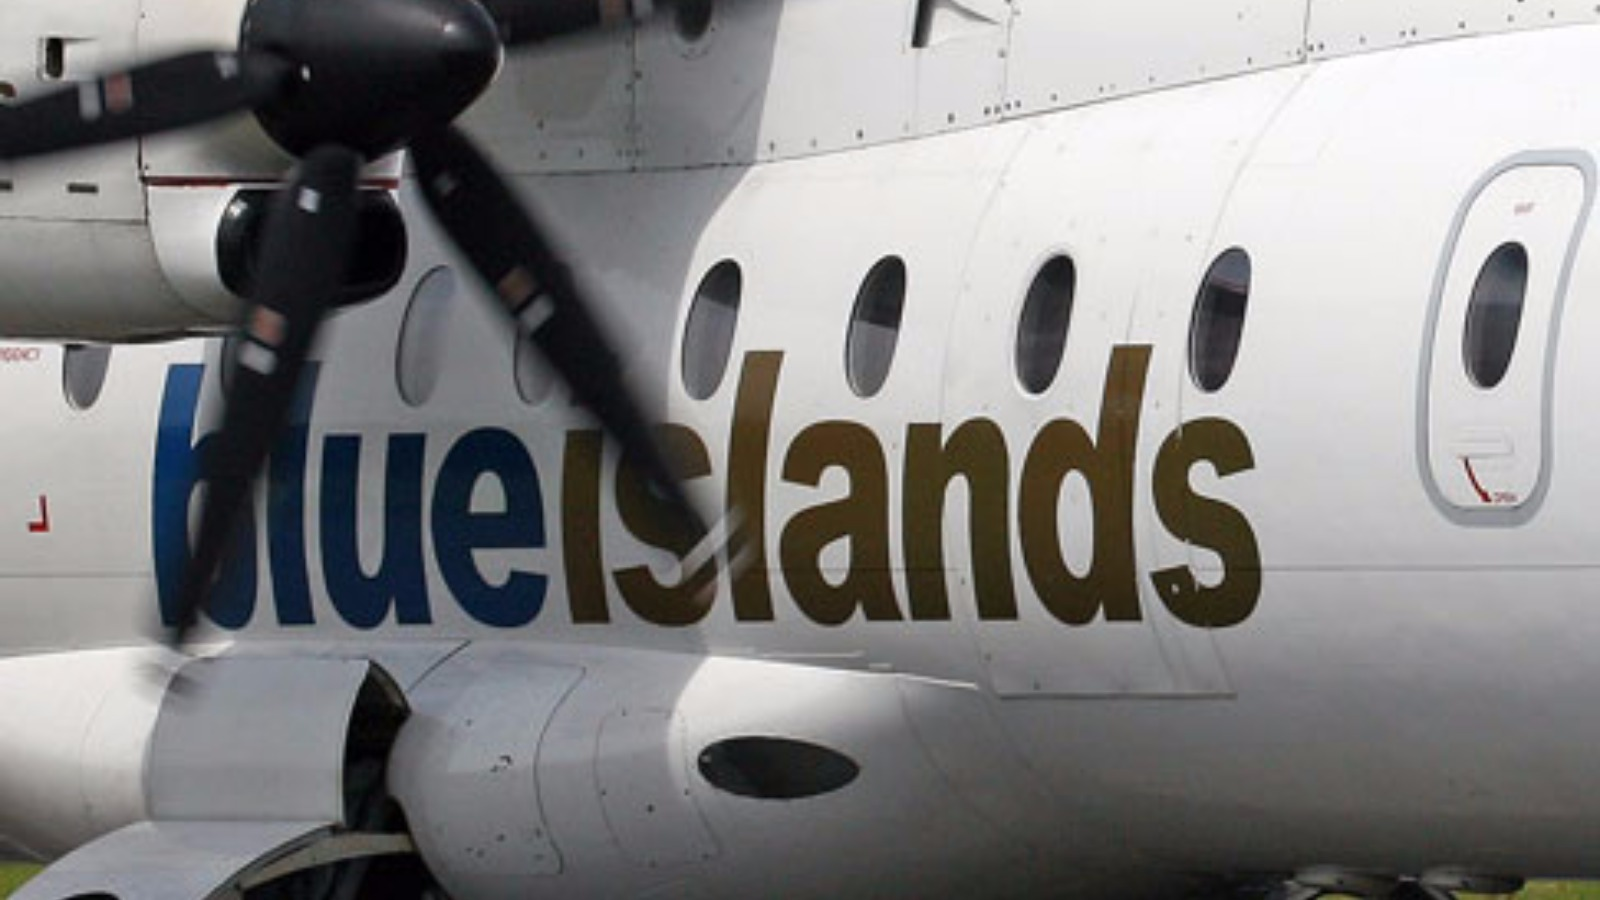 ... flight returns to Southampton as precaution   Channel - ITV News